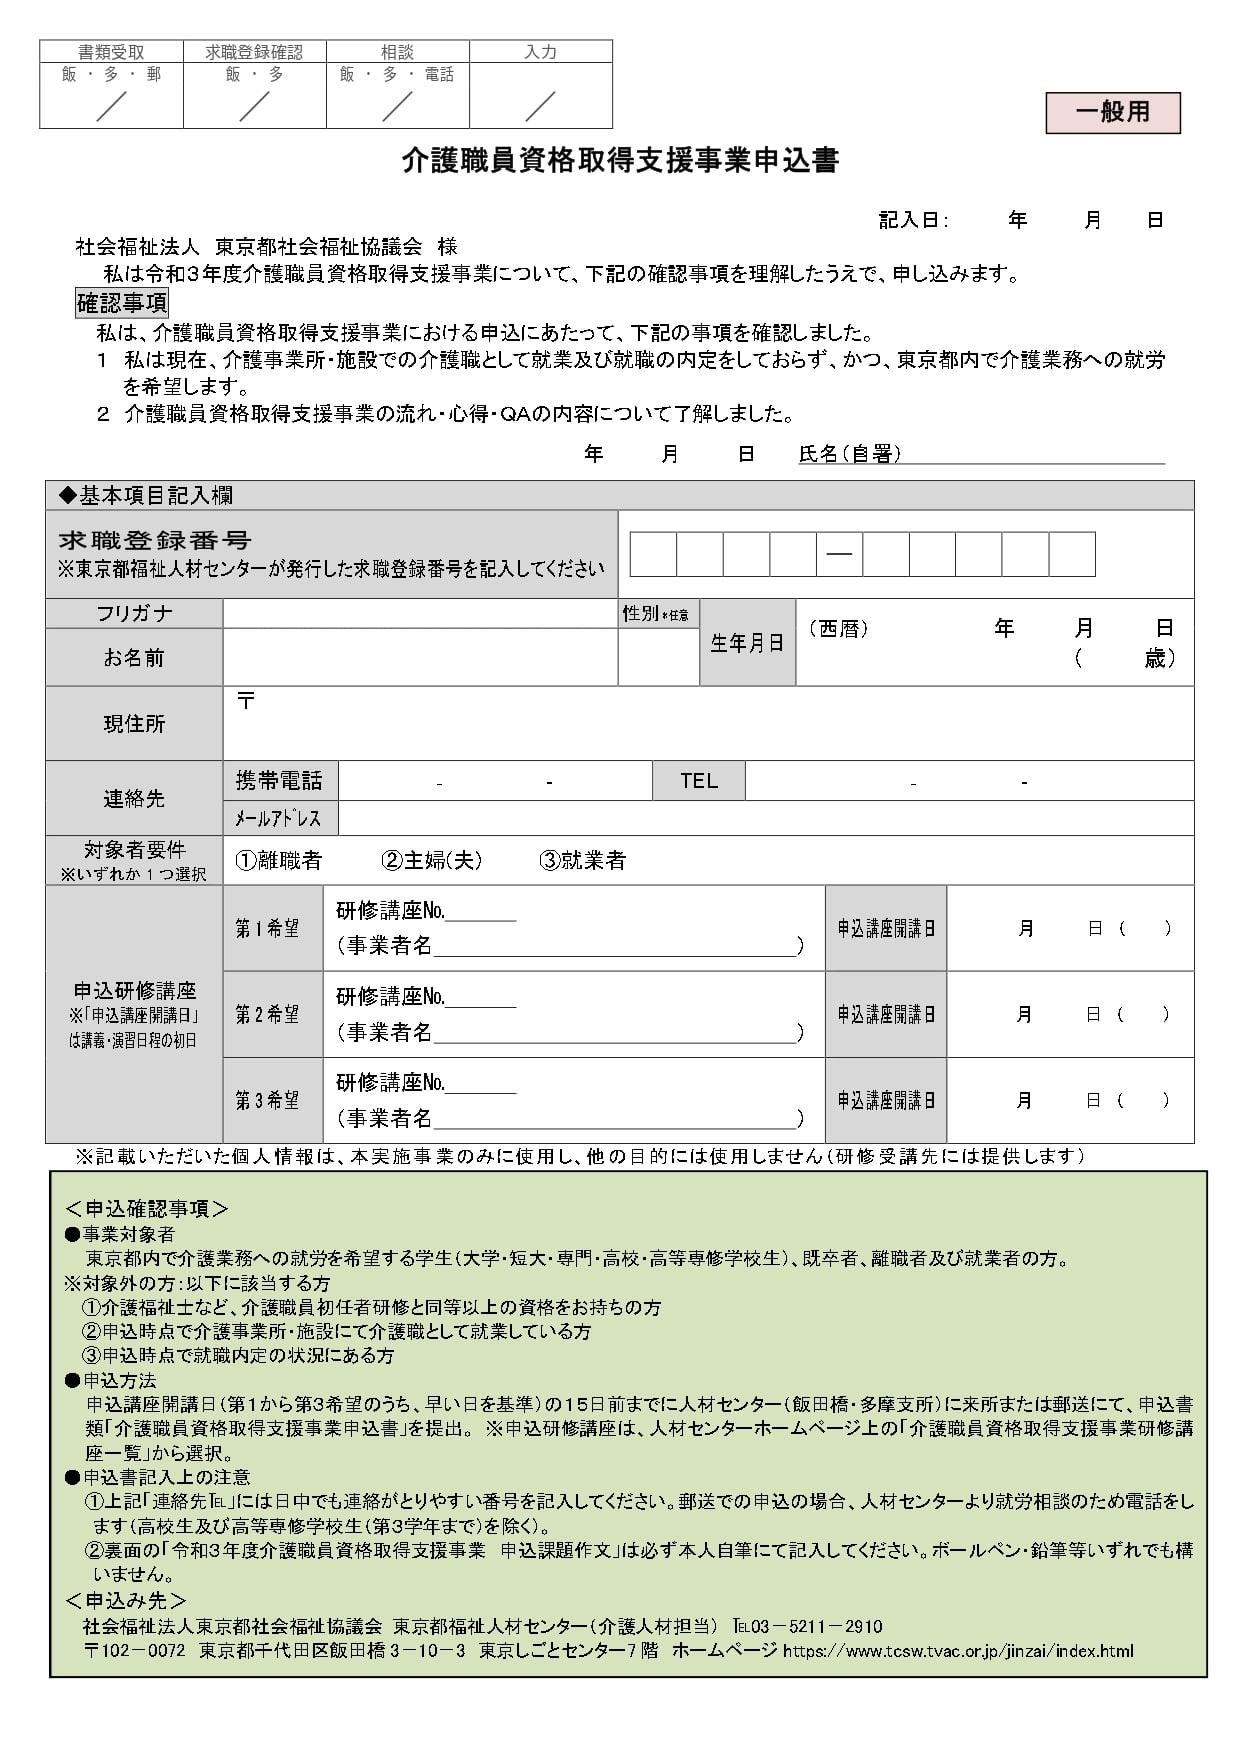 10mousikomisho-ippannyou_page-0001-min